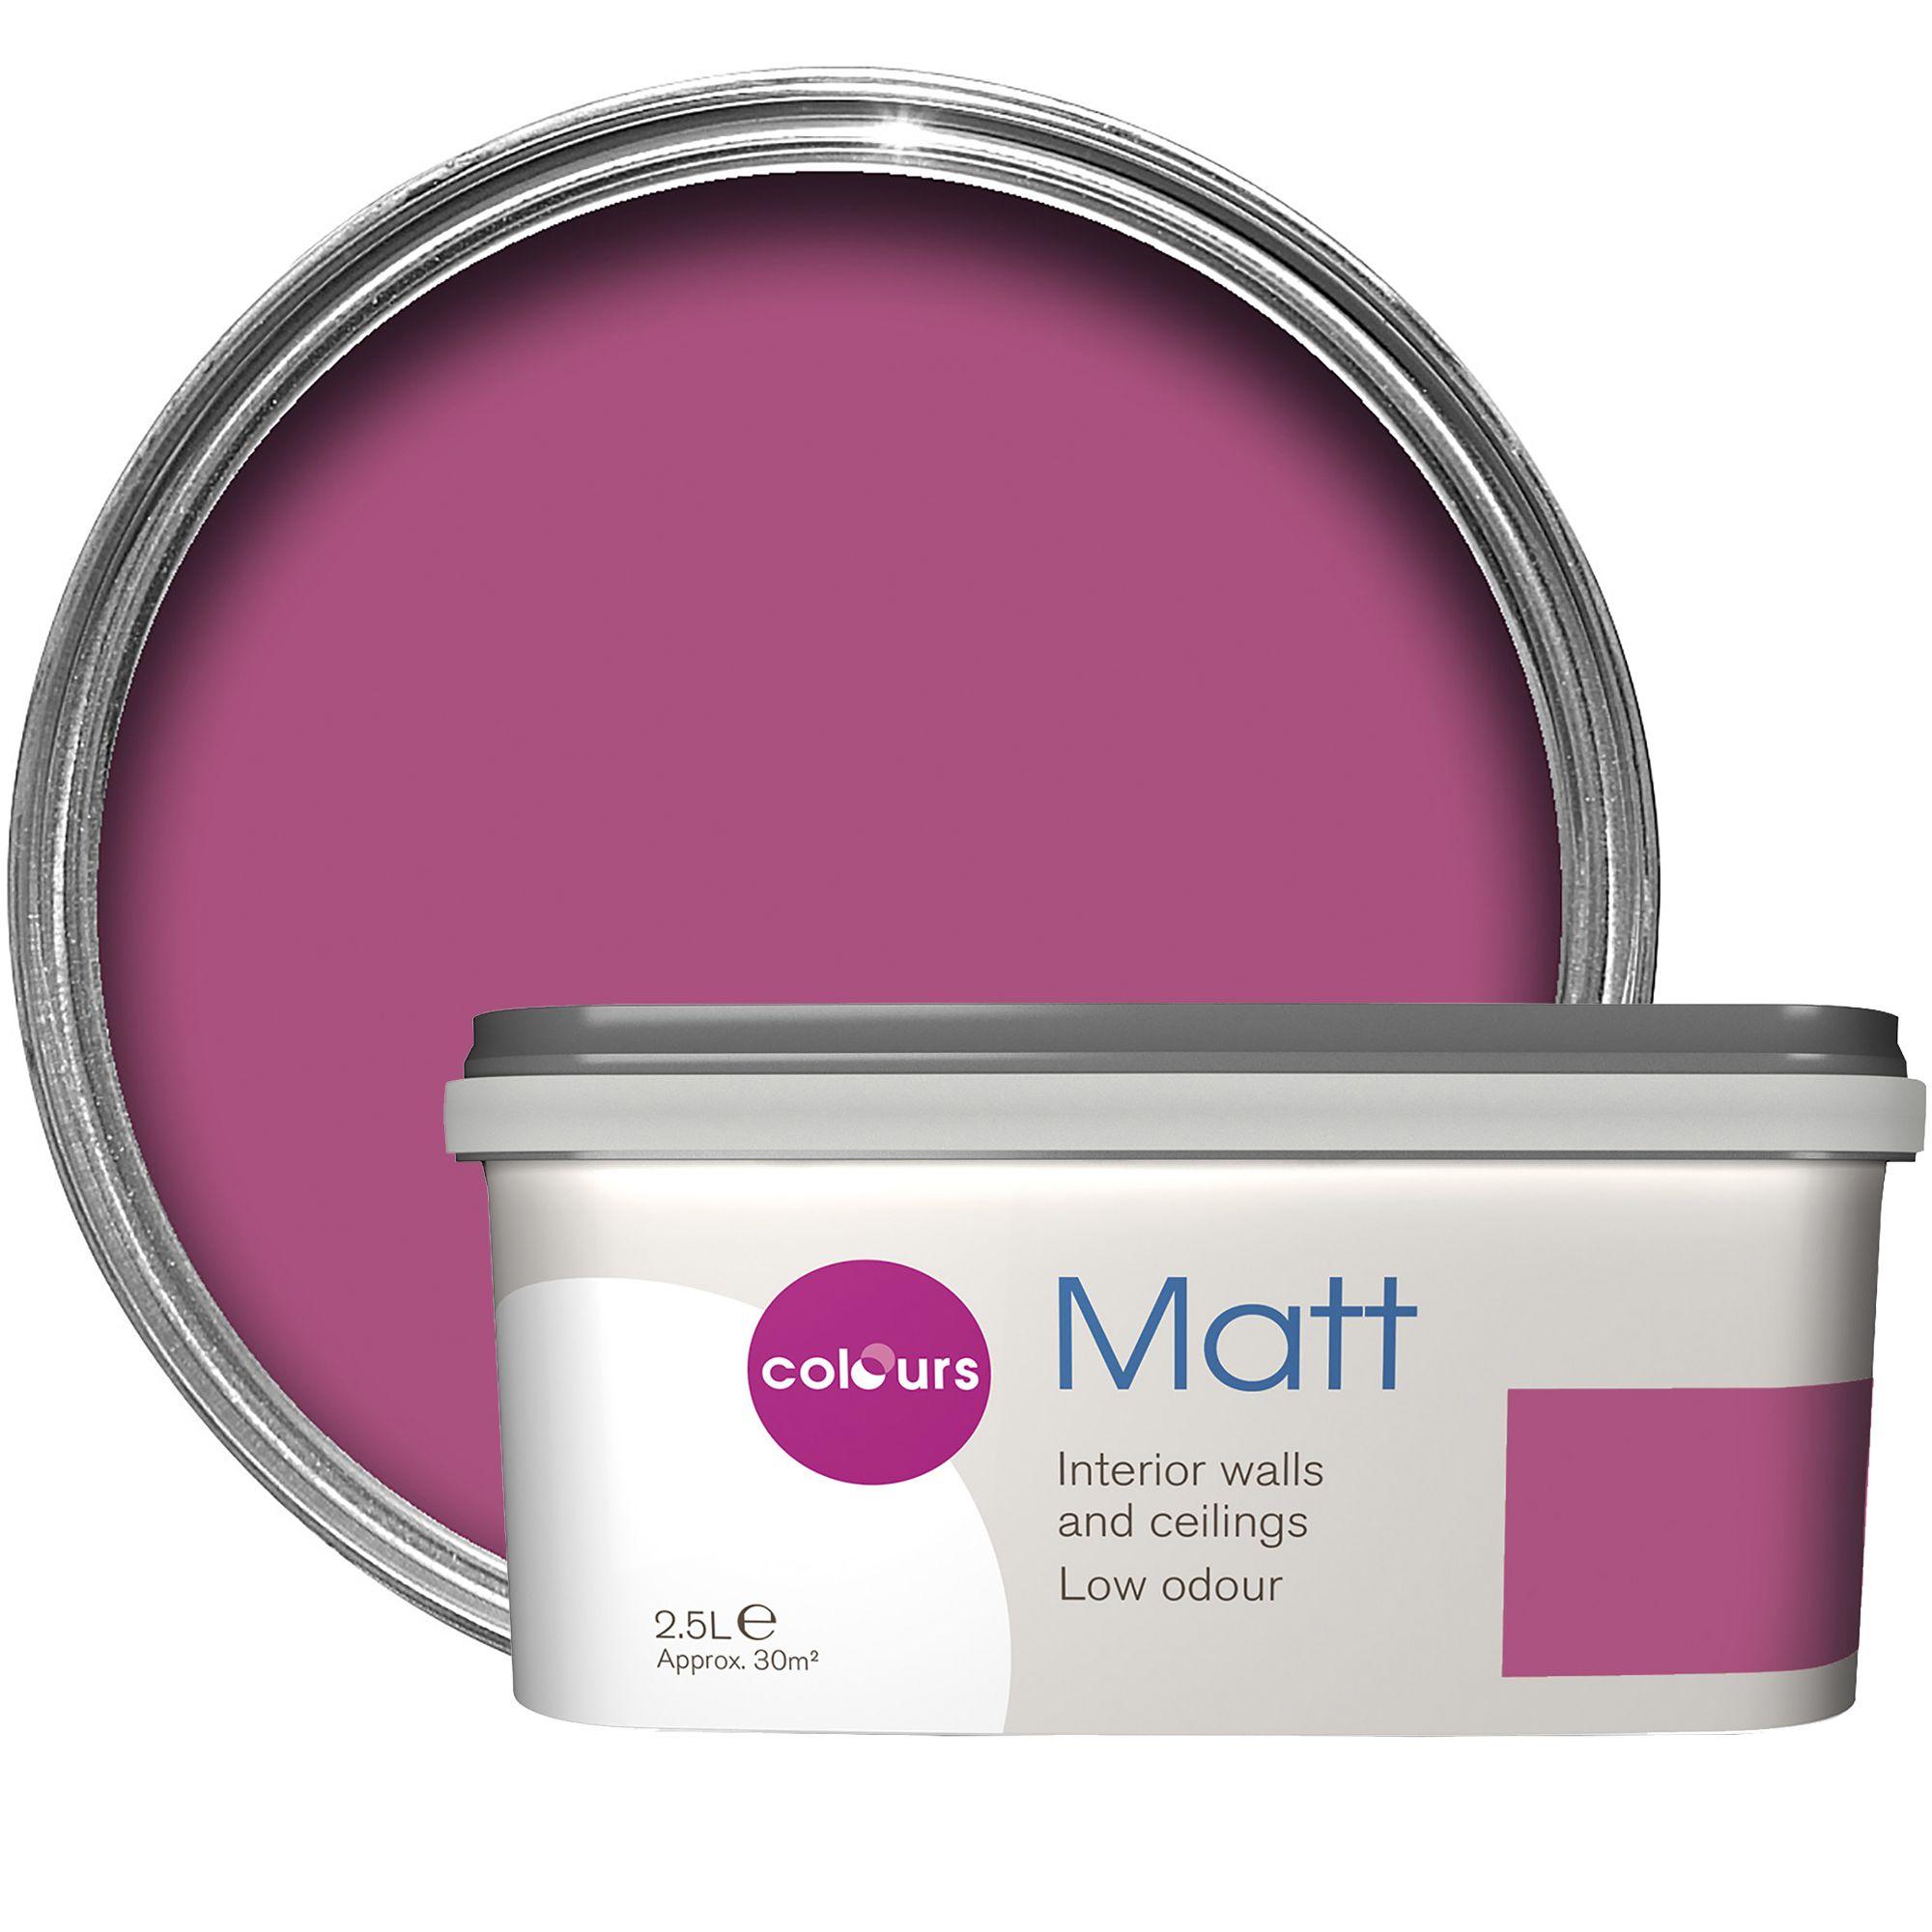 Colours Standard Playful Pink Metallic Emulsion Paint 2.5l